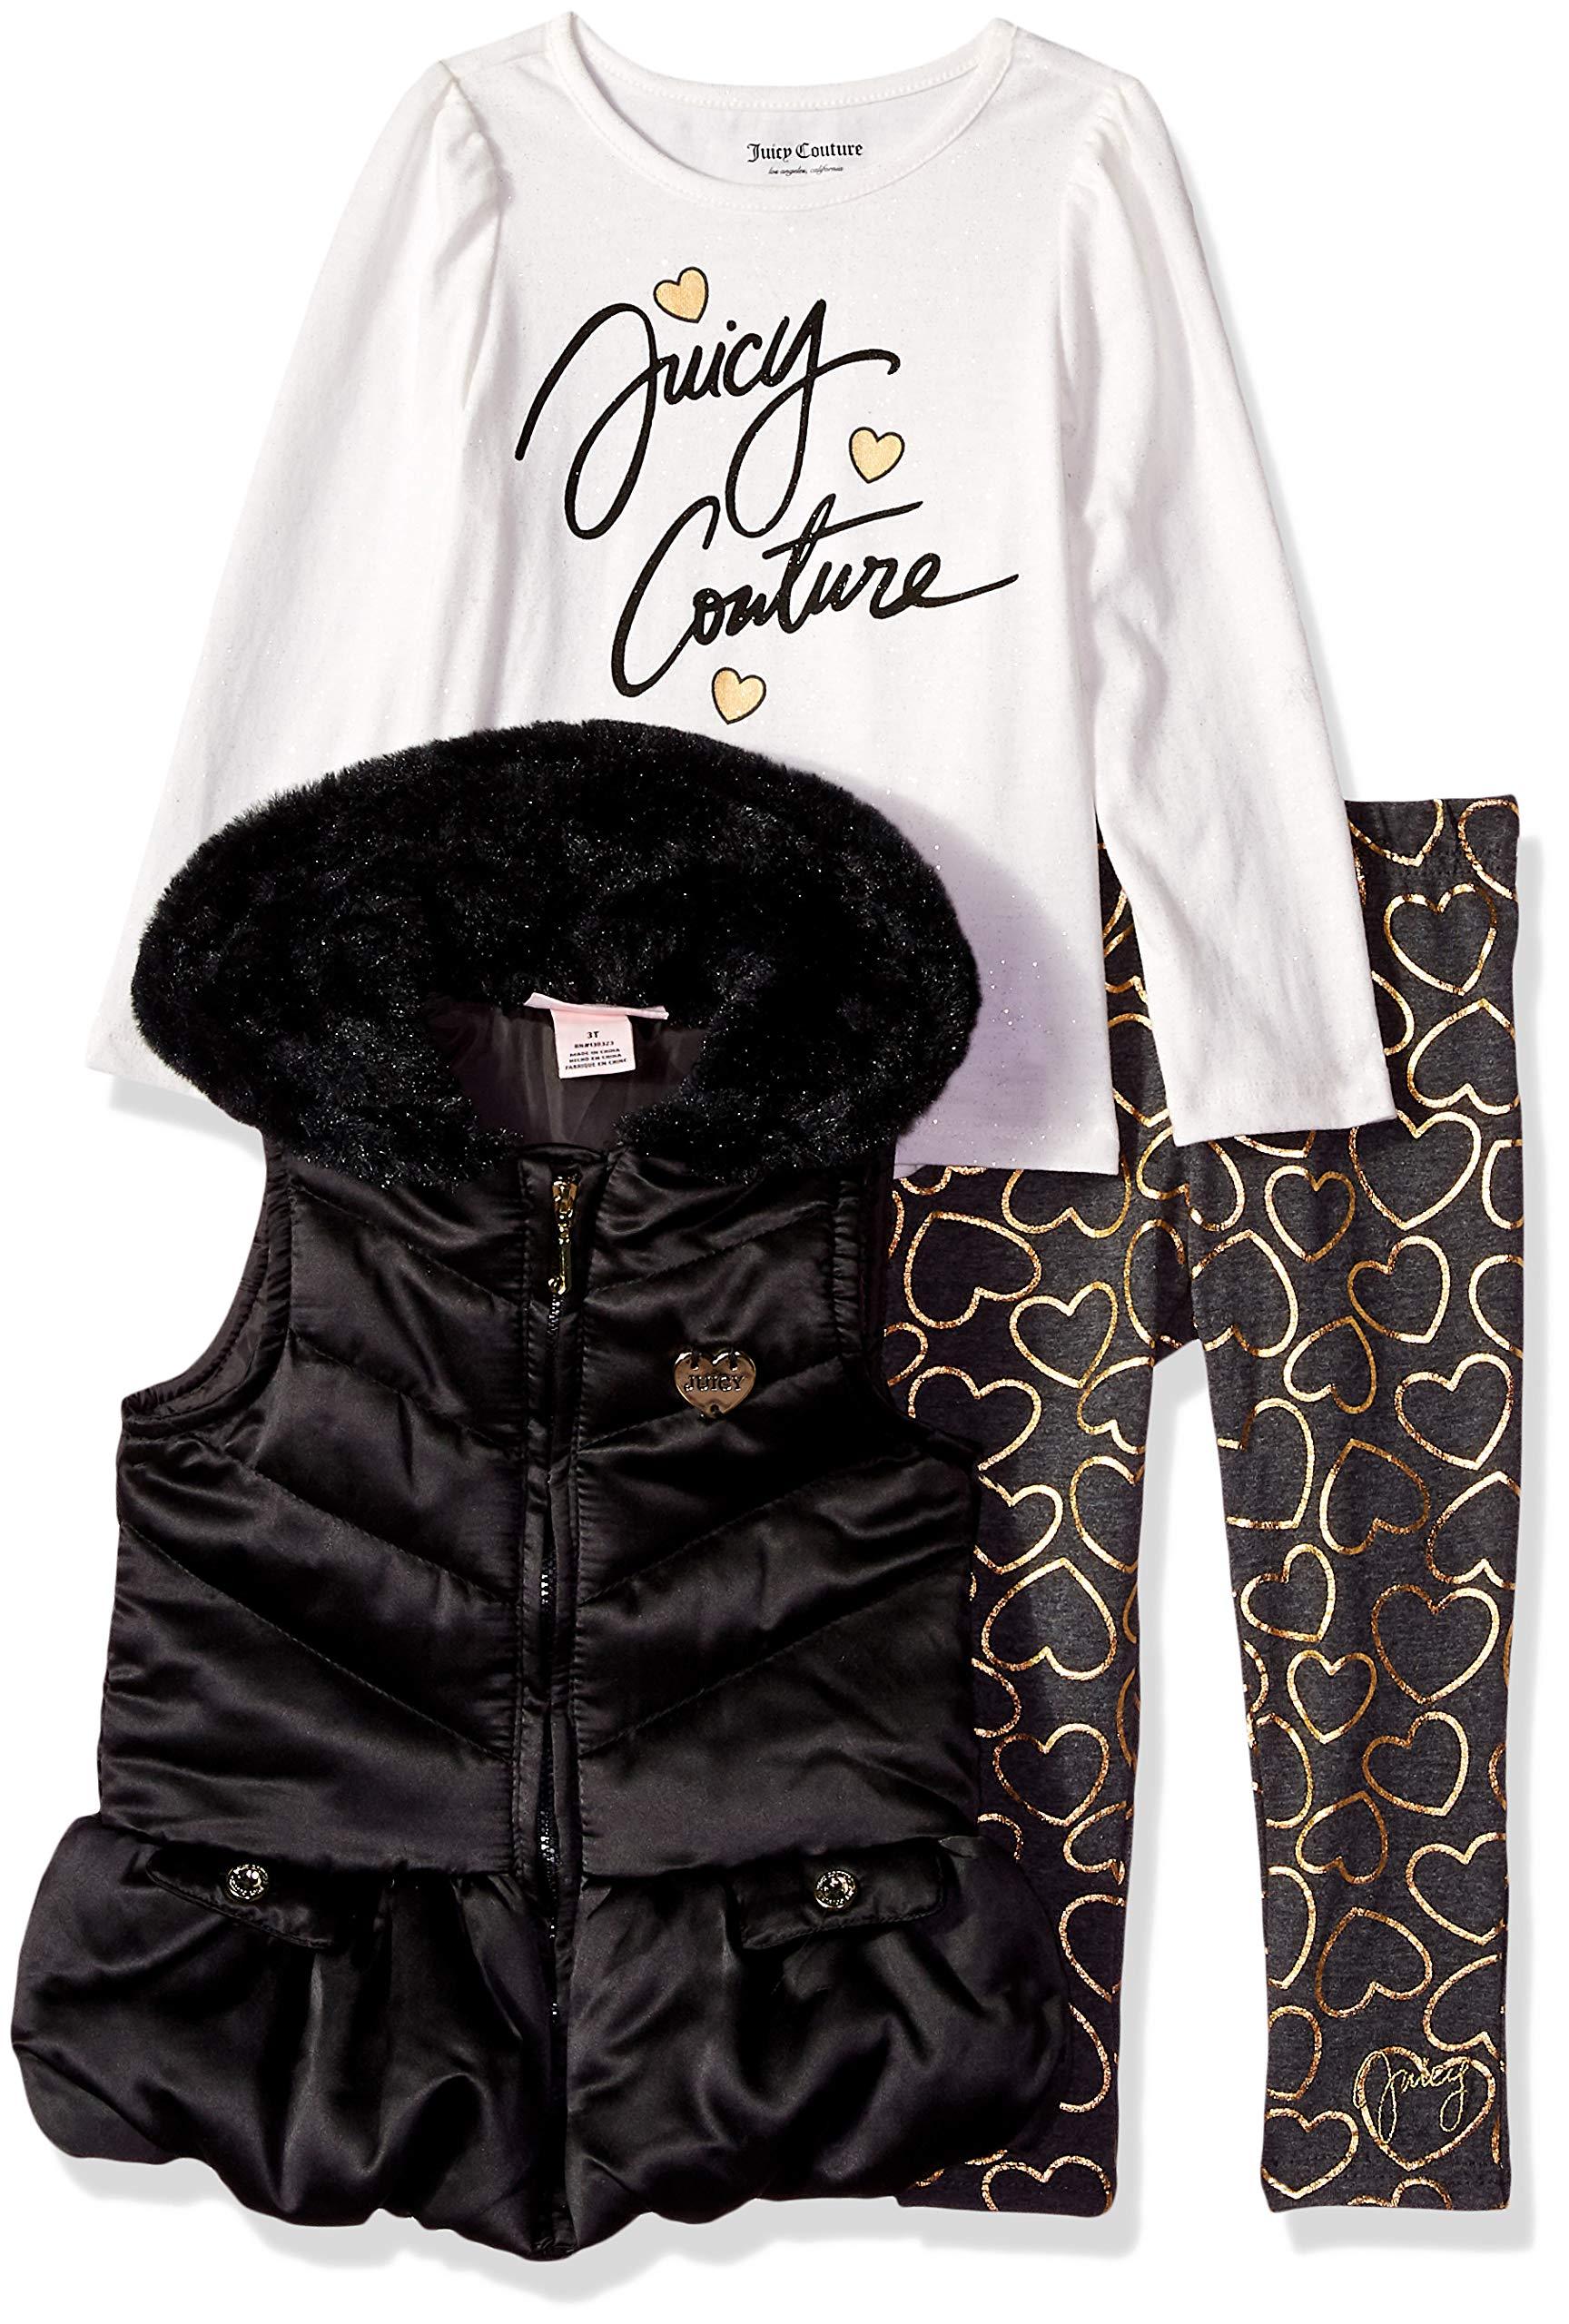 Juicy Couture Girls' 3 Pieces Puff Vest Set